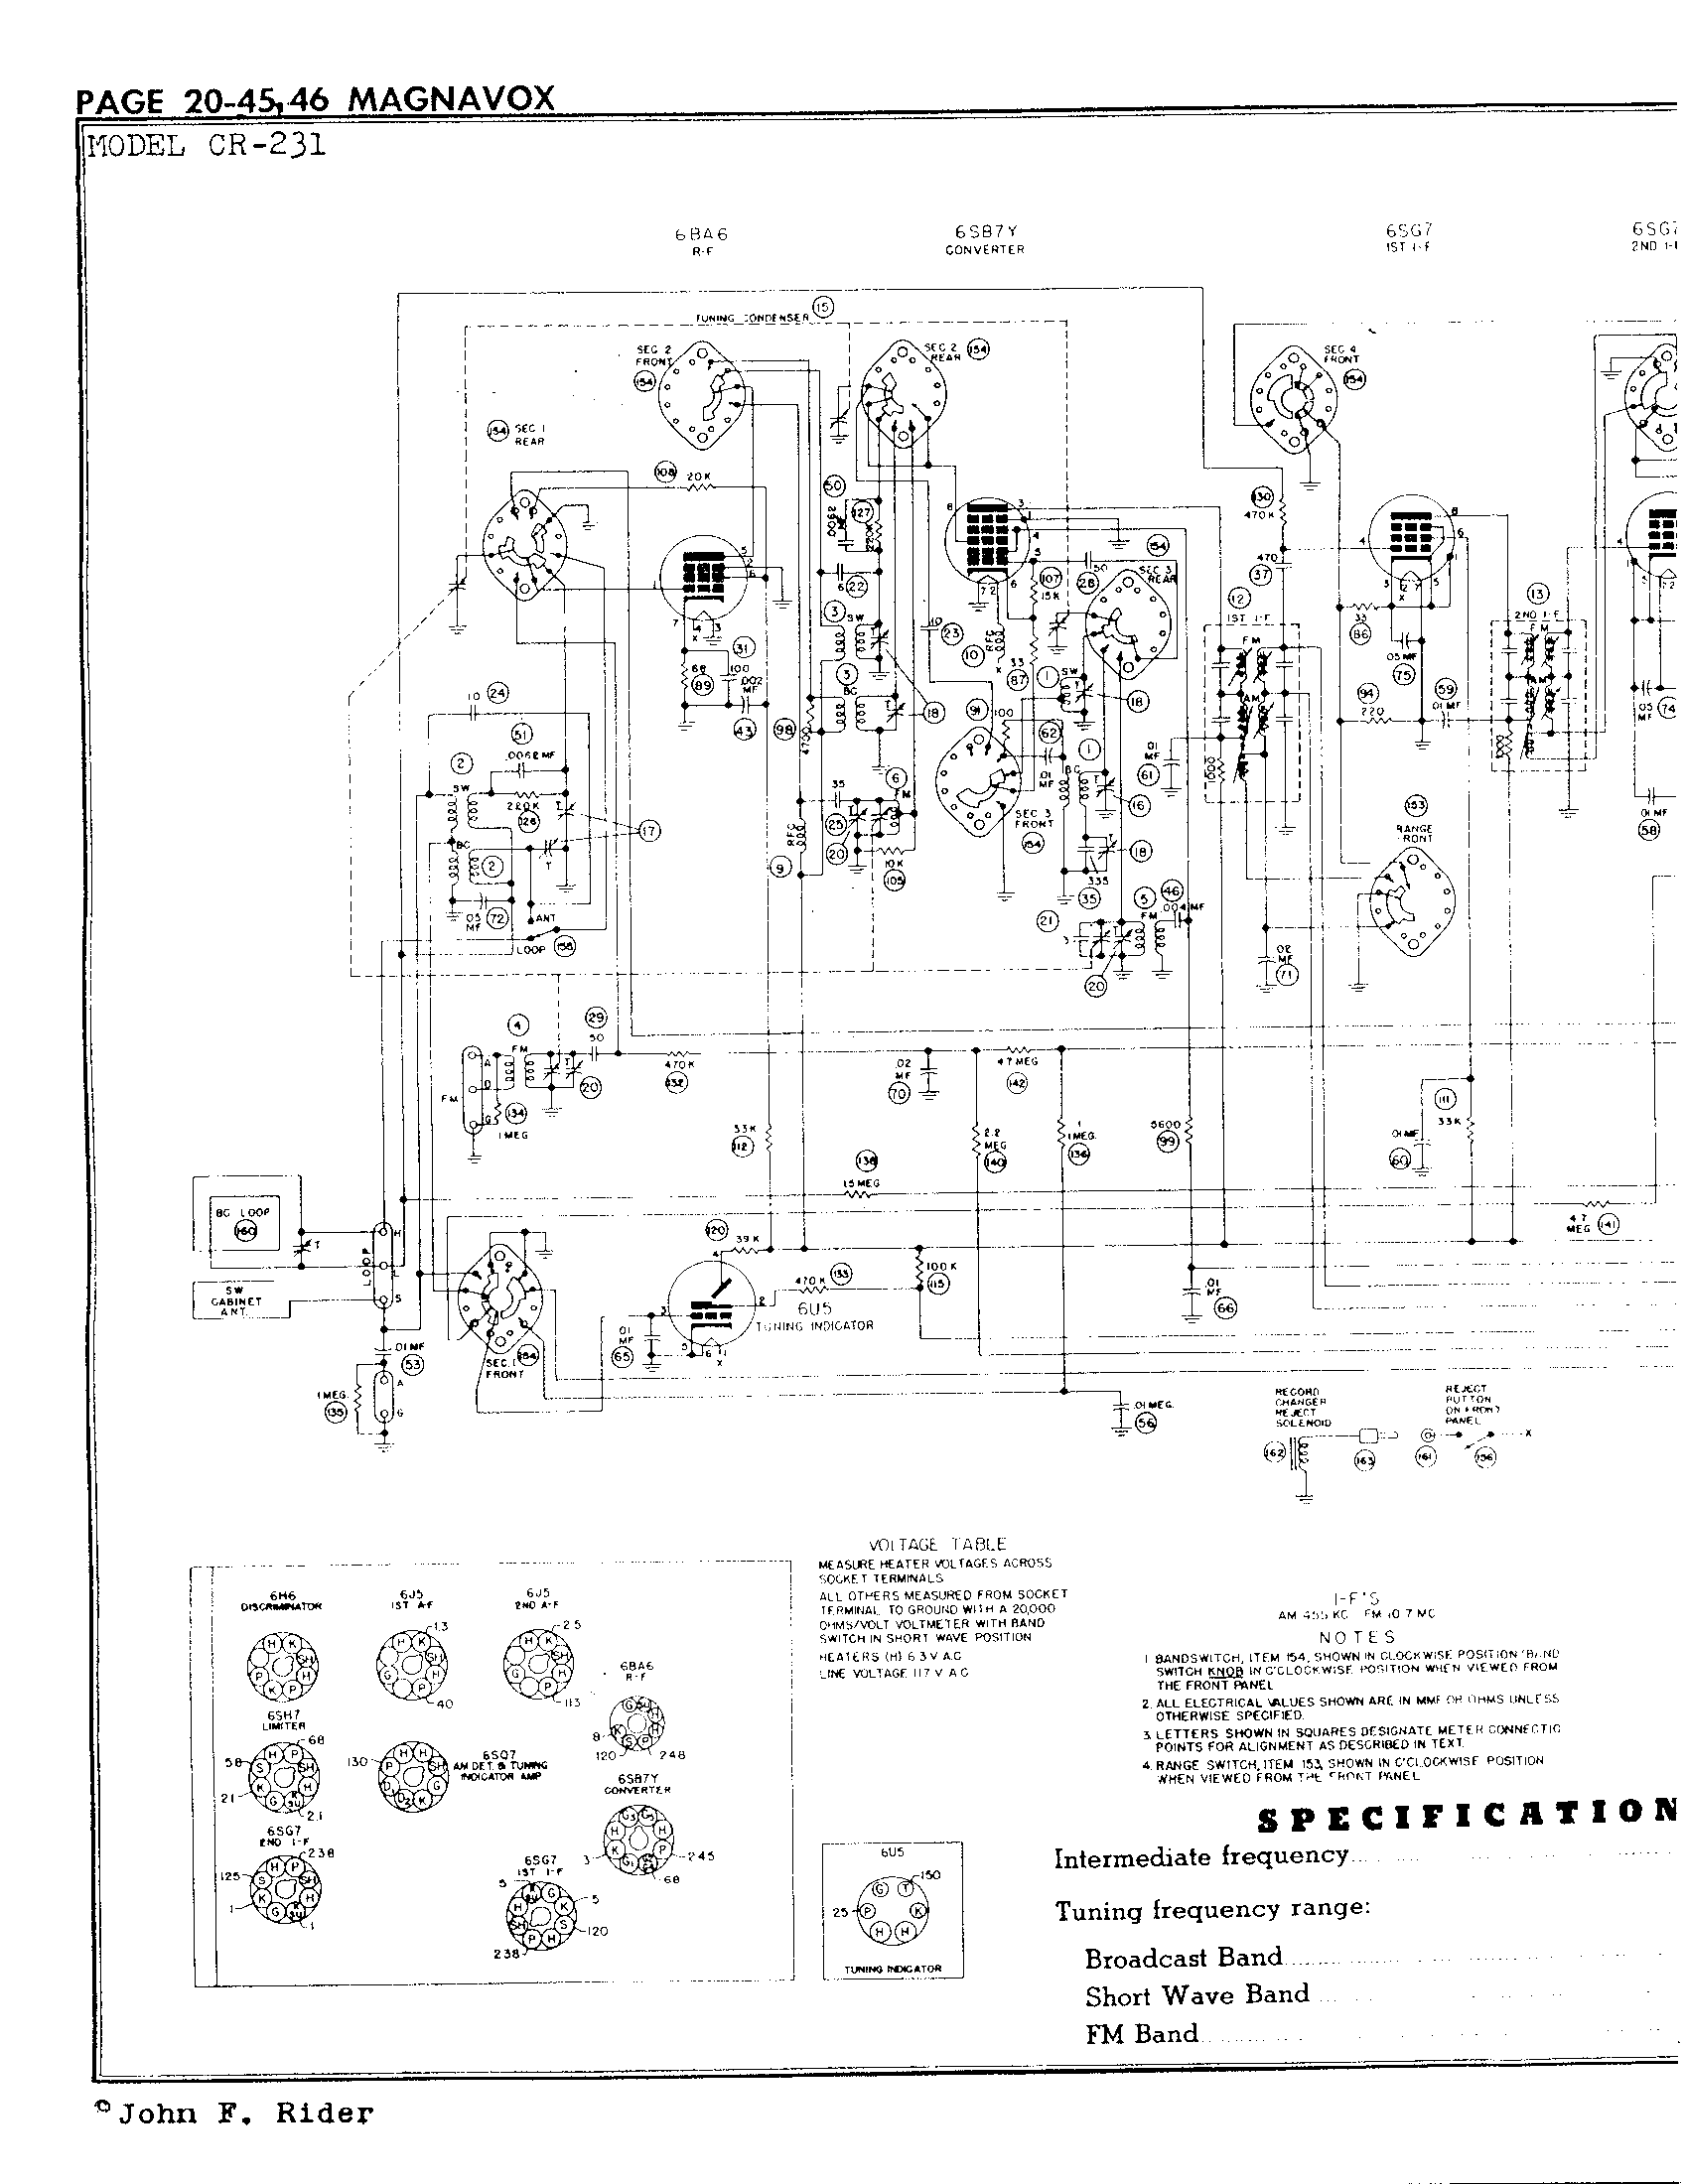 Magnavox Tv Schematic Diagram - Schematic Wiring Diagram